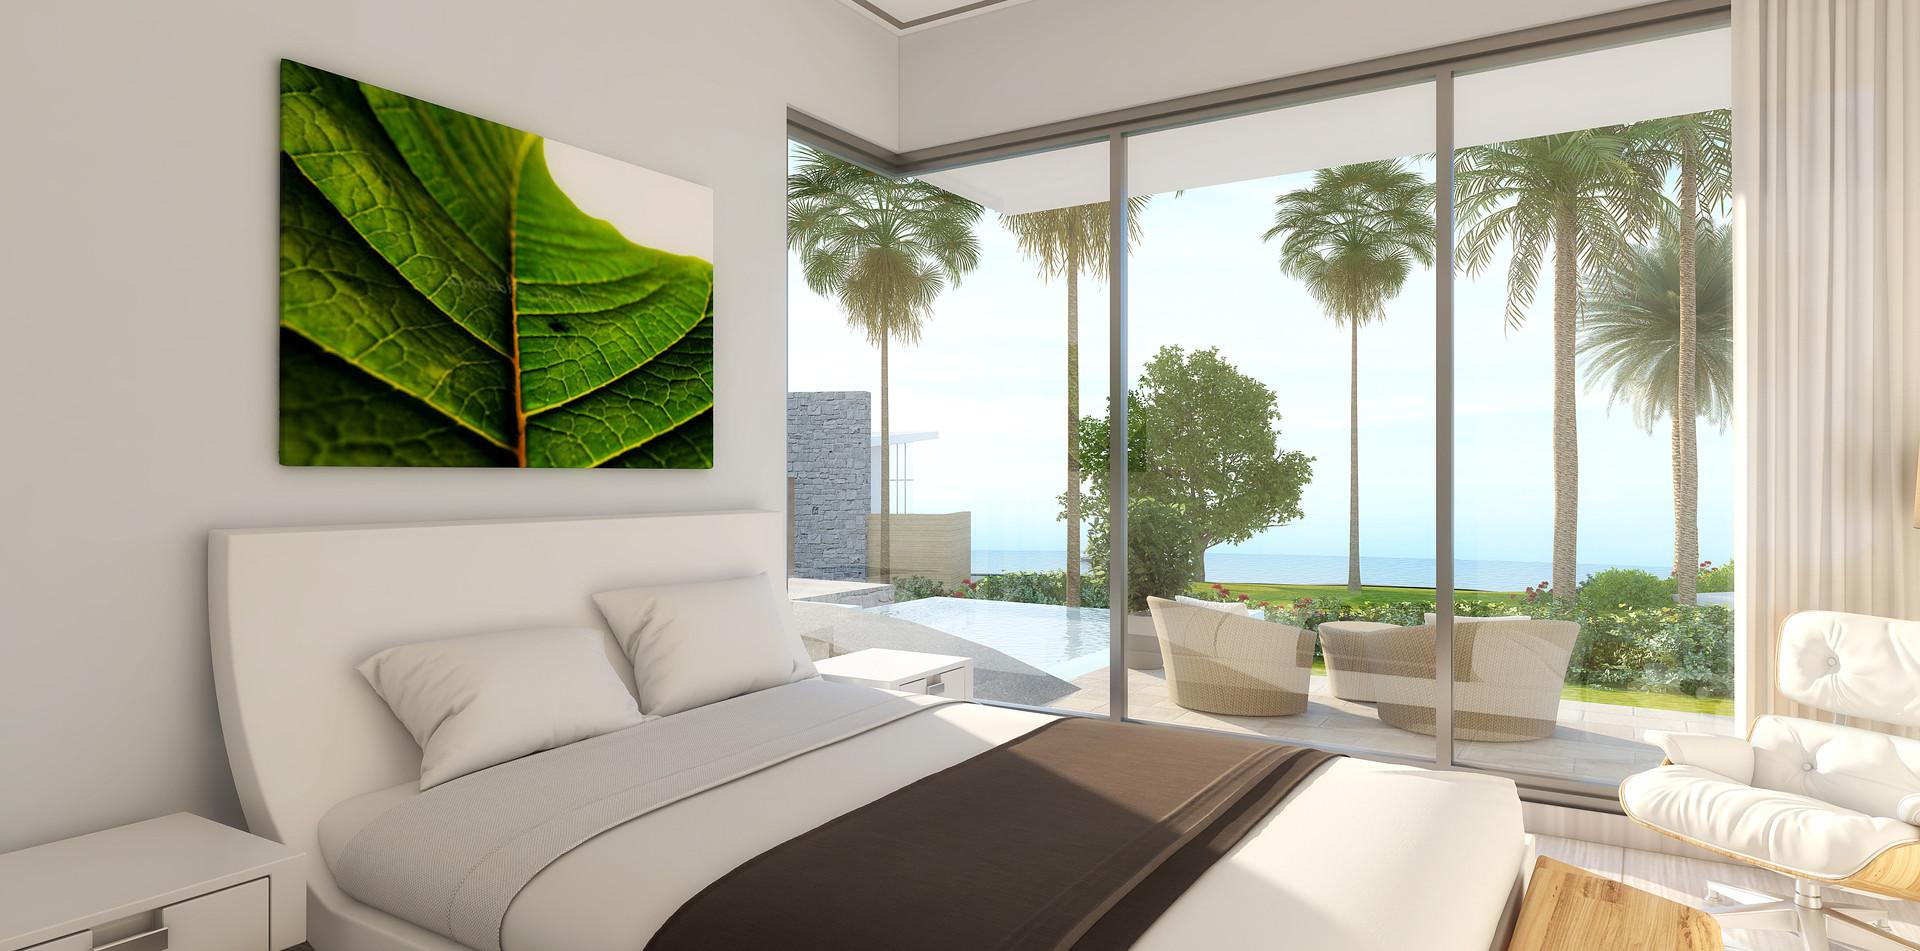 150422-ian-sunstone-front_villa_bedroom.